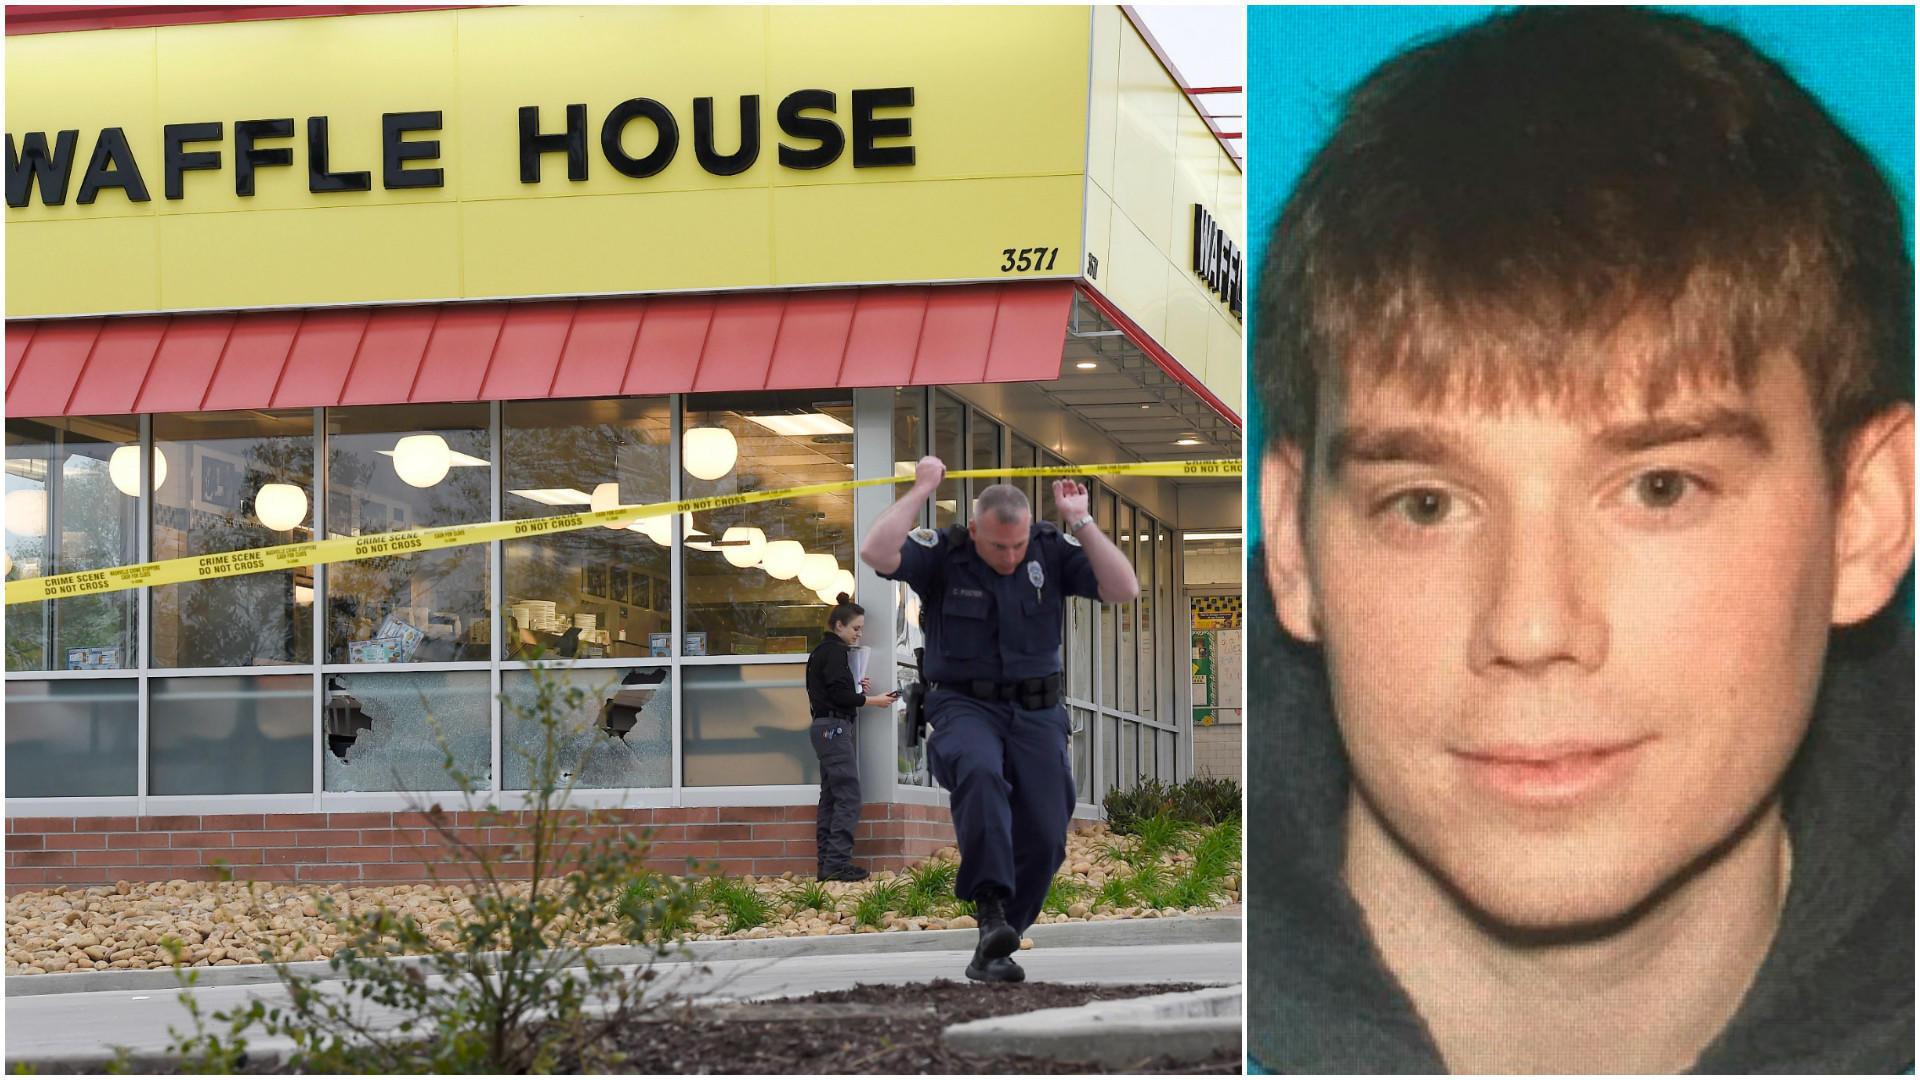 Naked Gunman Kills 4 at Tennessee Waffle House, Suspect